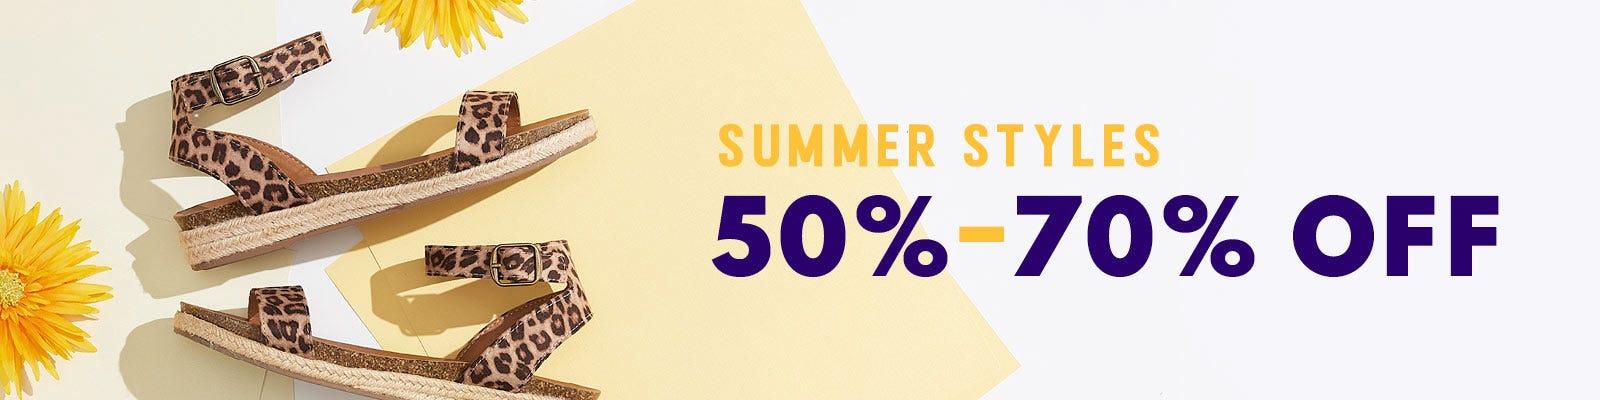 50%-70% OFF Summer Styles